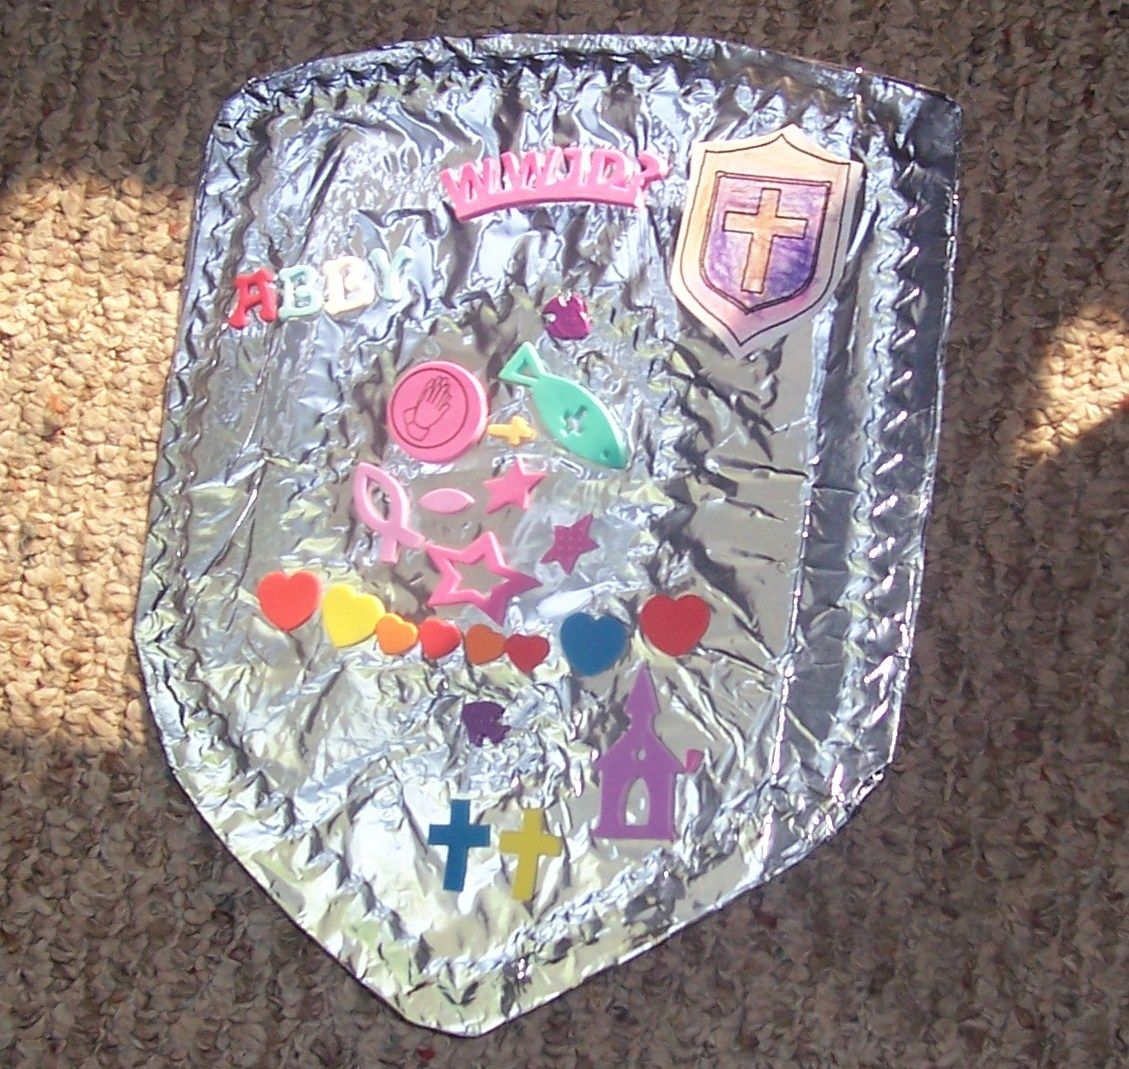 Vacation bible school crafts ideas - Shield Craft For Vacation Bible School